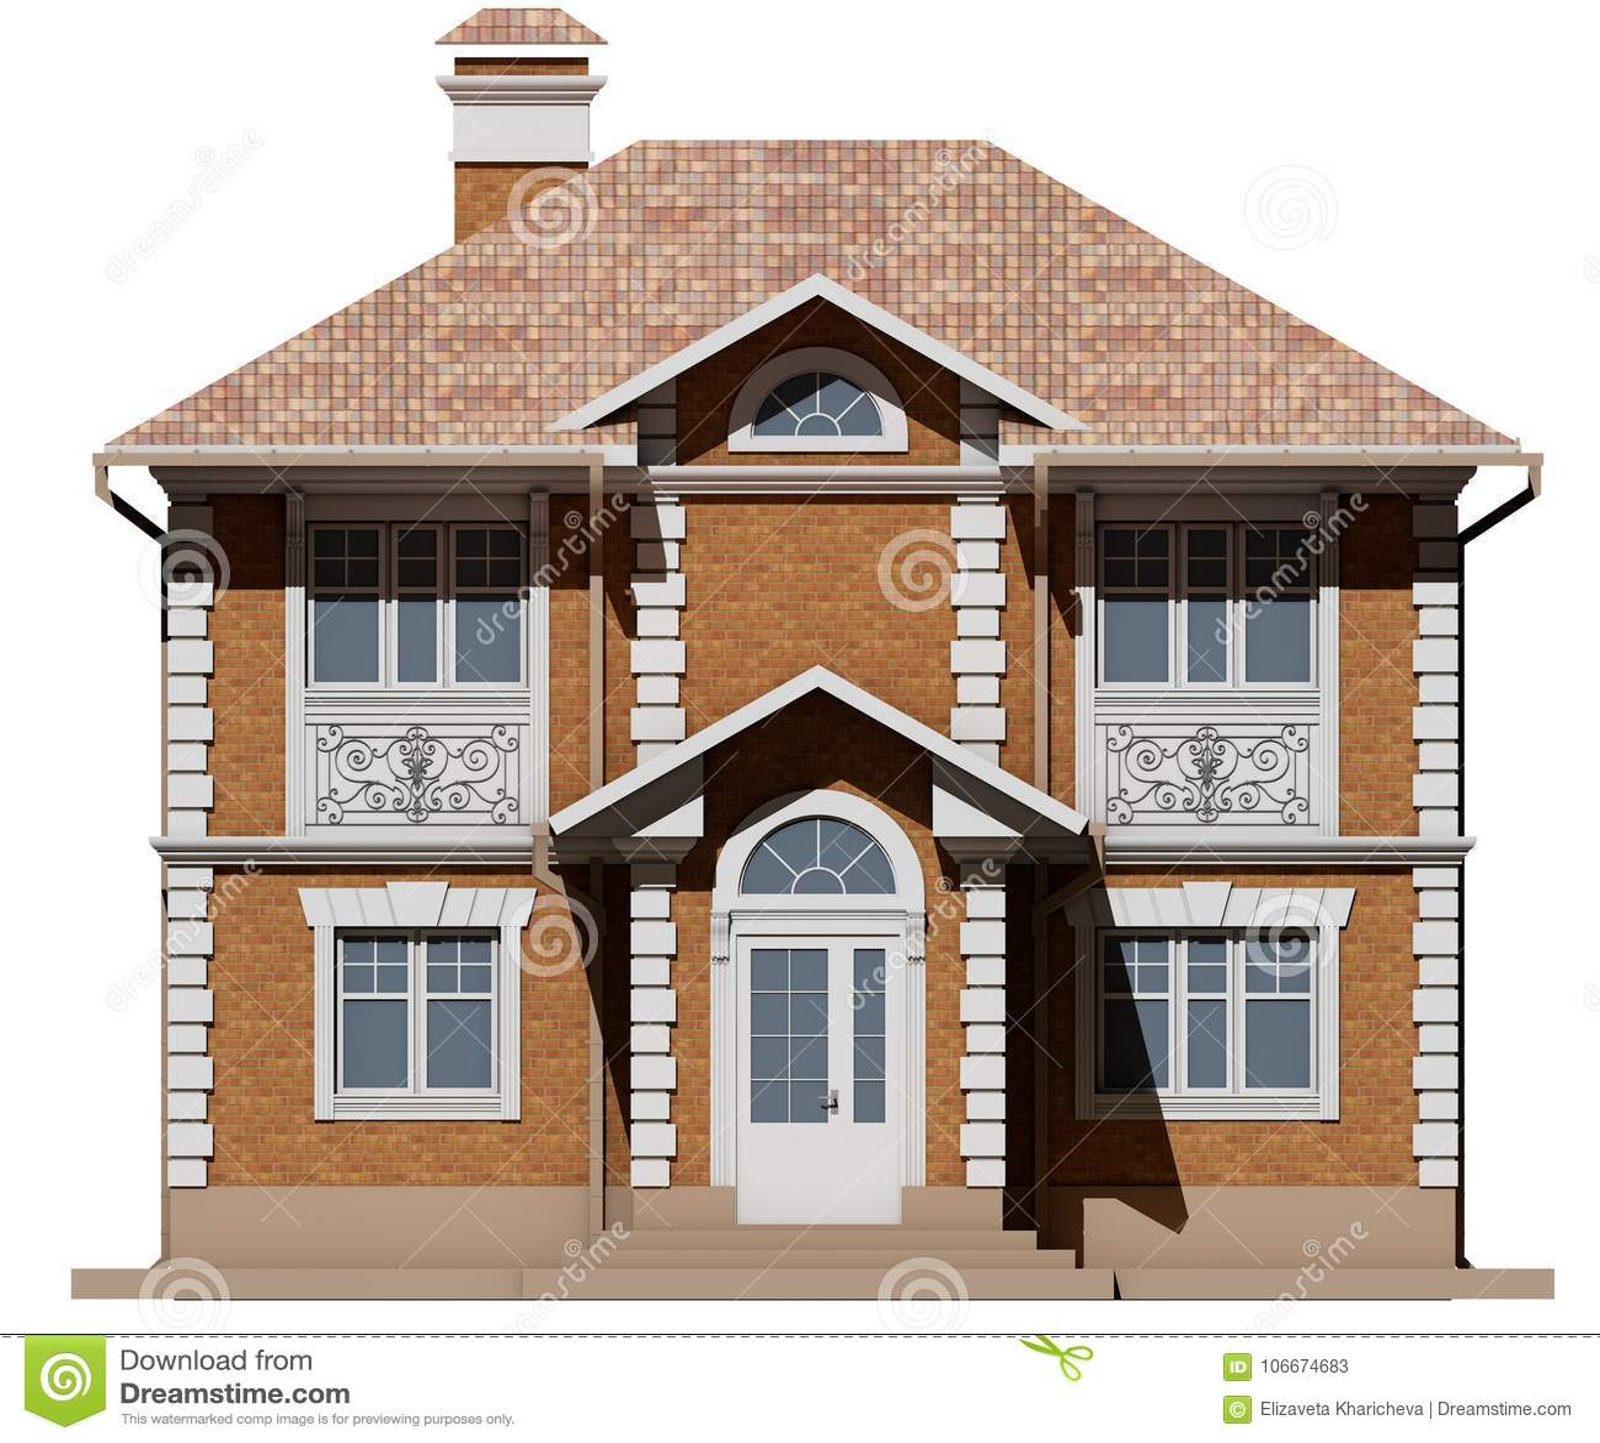 Главный фасад коттеджа кирпича симметрия перевод 3d